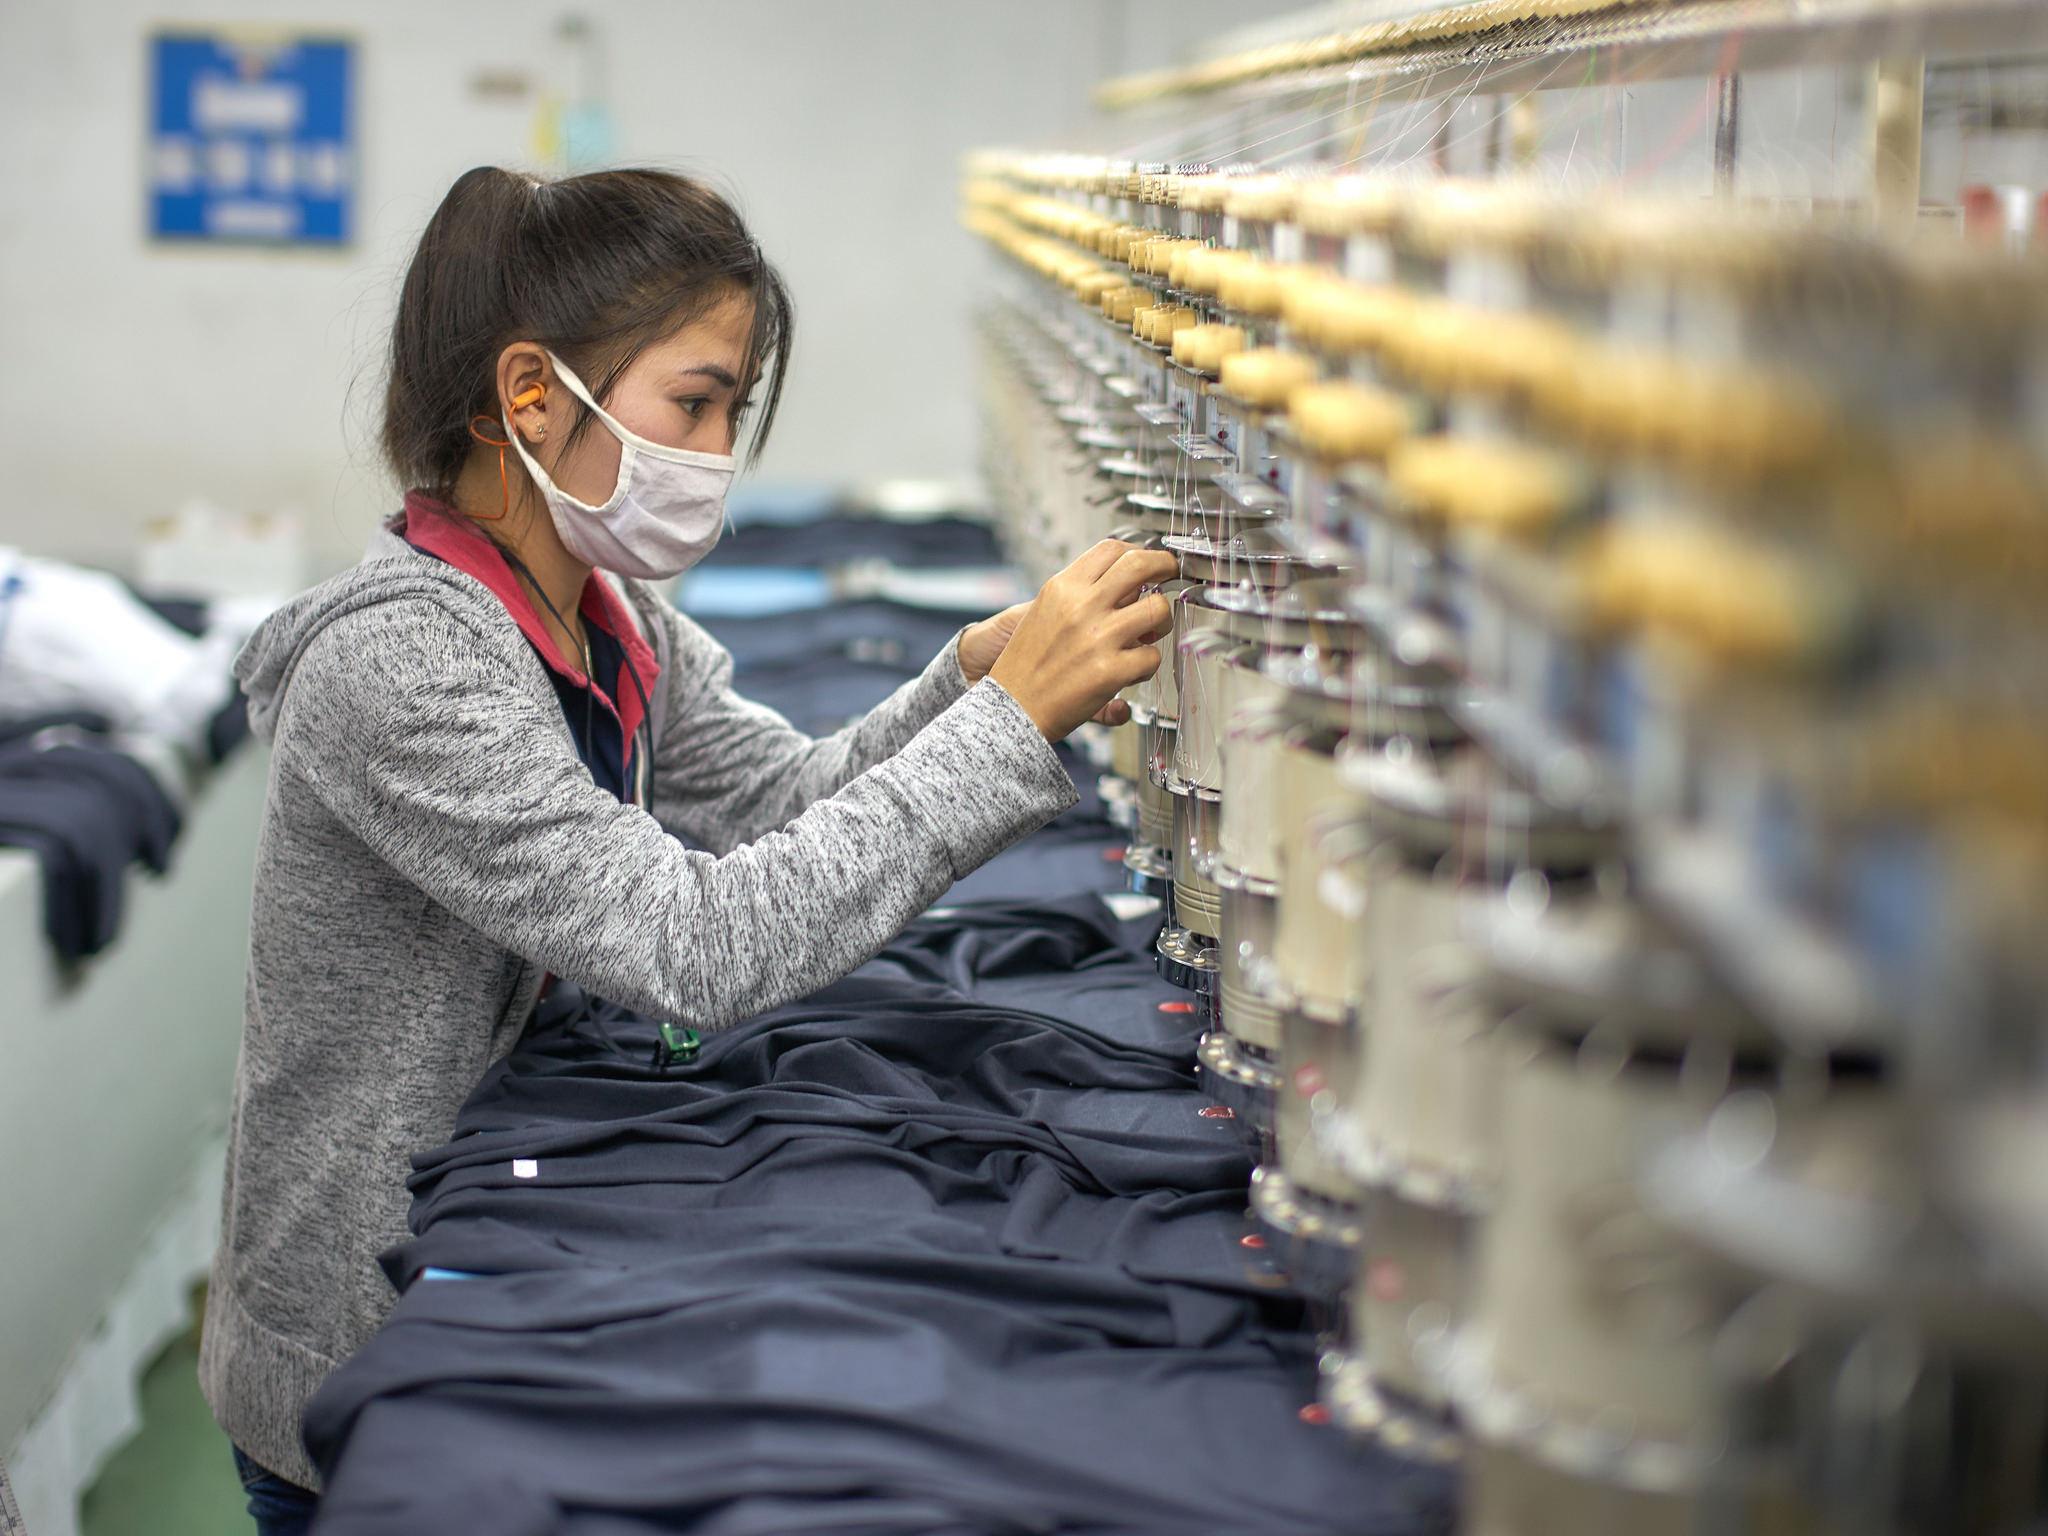 ILO in Asia and the Pacific